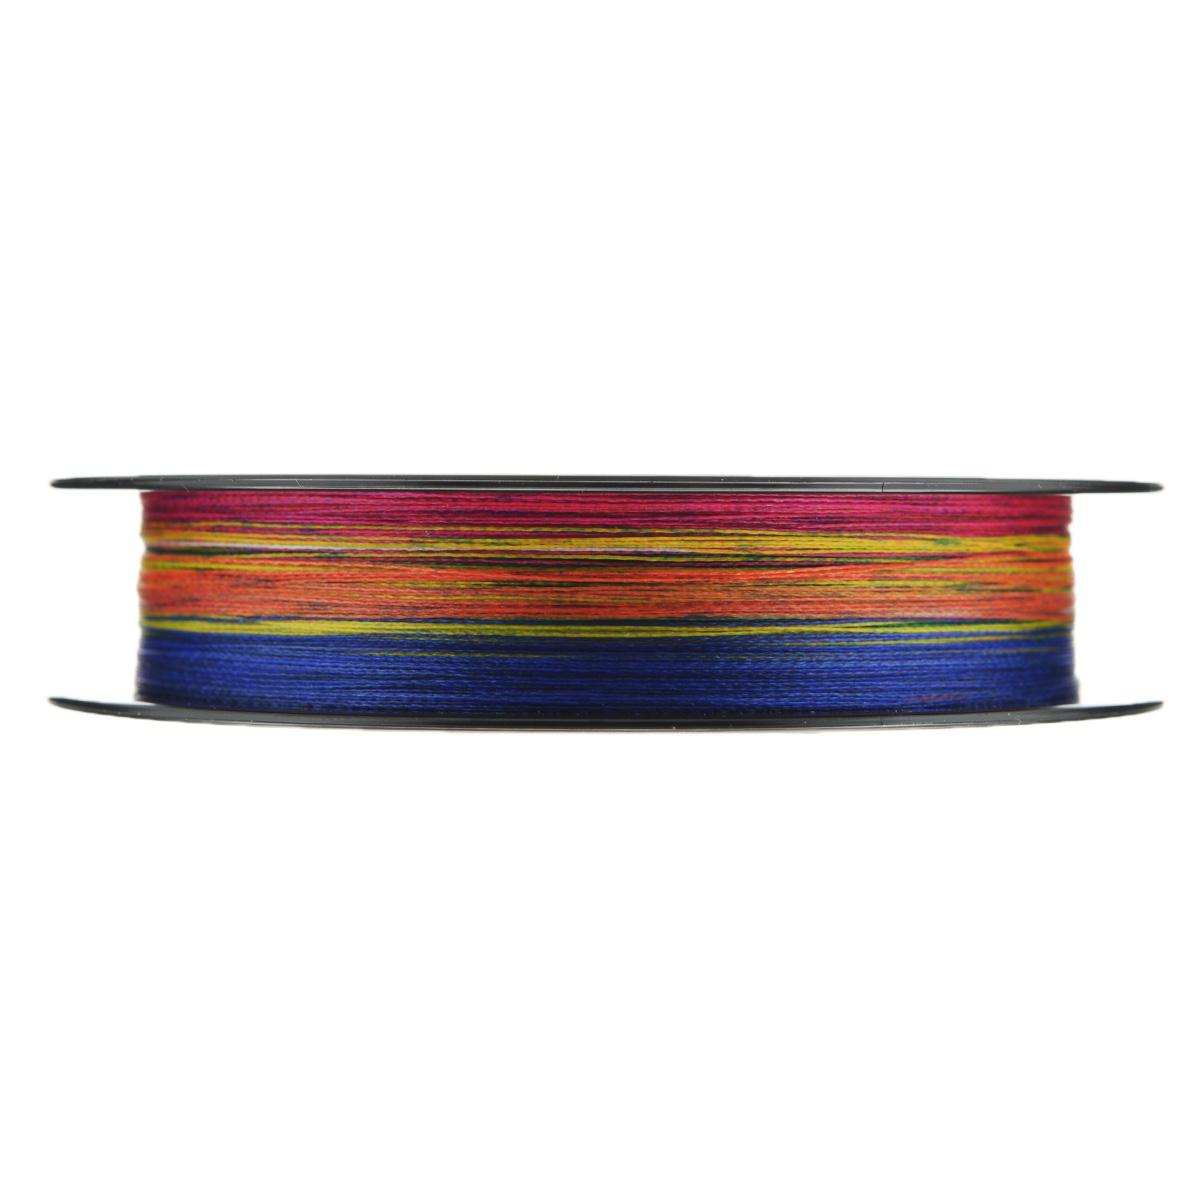 "Леска плетеная Allvega ""Bullit Braid"", цвет: мульти, 150 м, 0,14 мм, 8,4 кг"